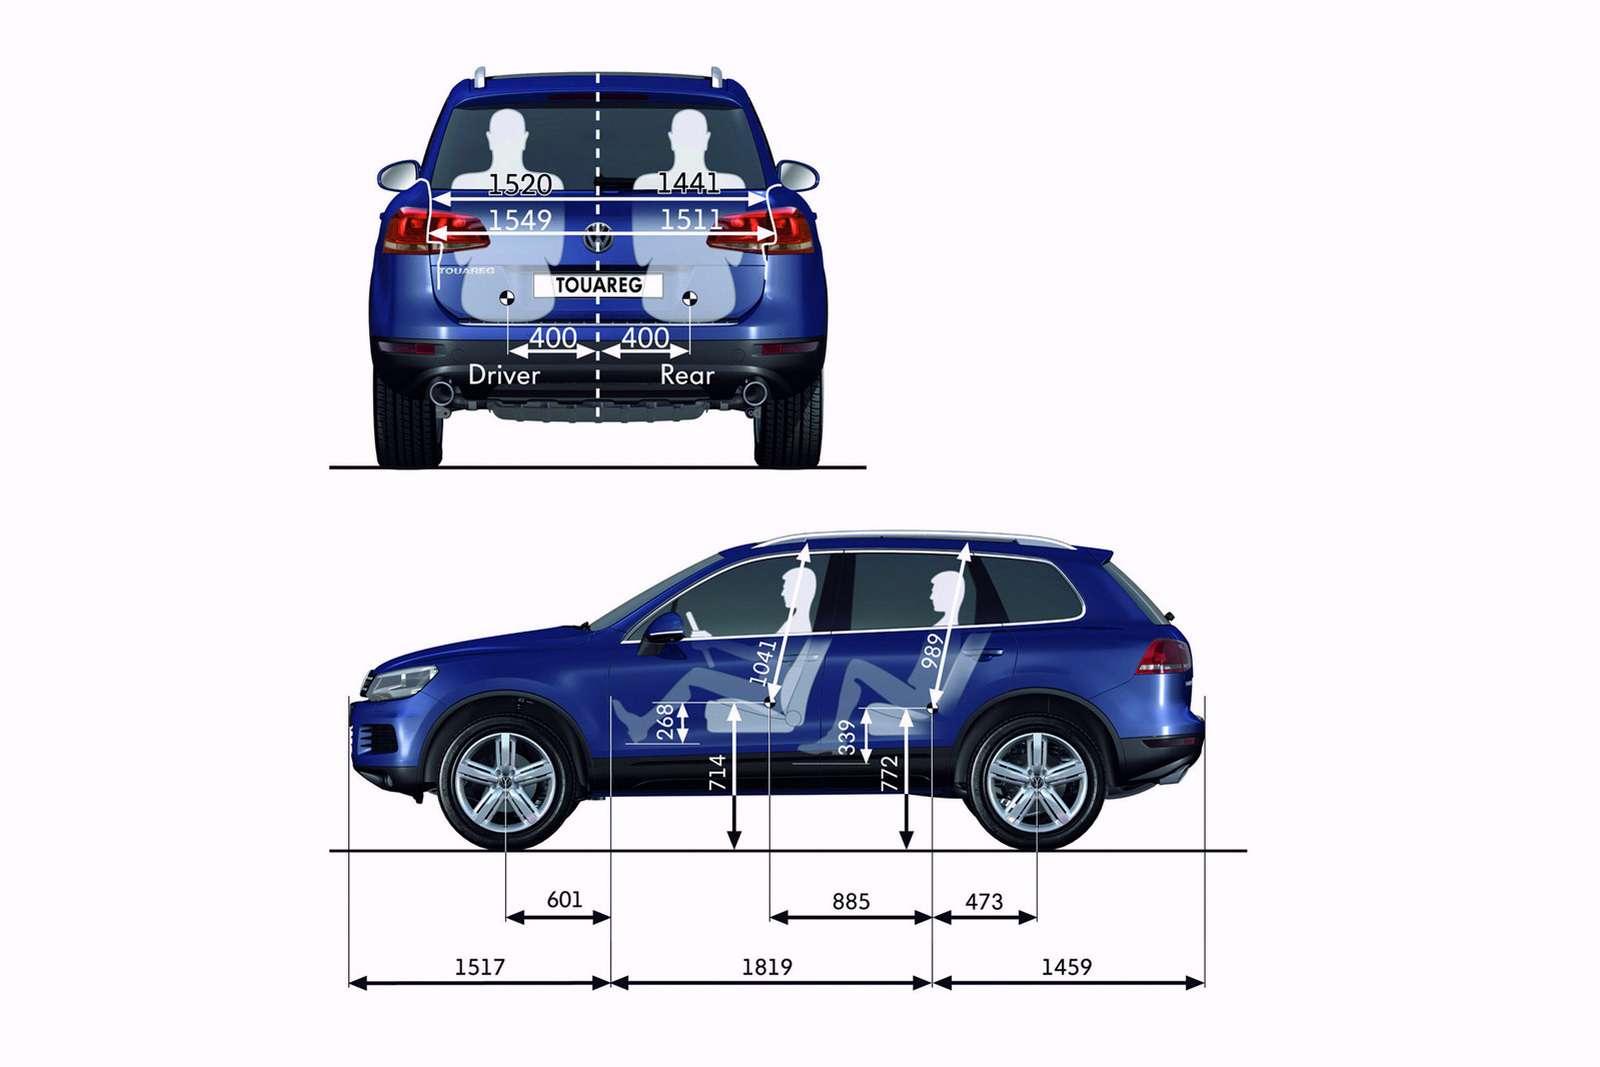 Volkswagen Touareg 2011 mega gallery